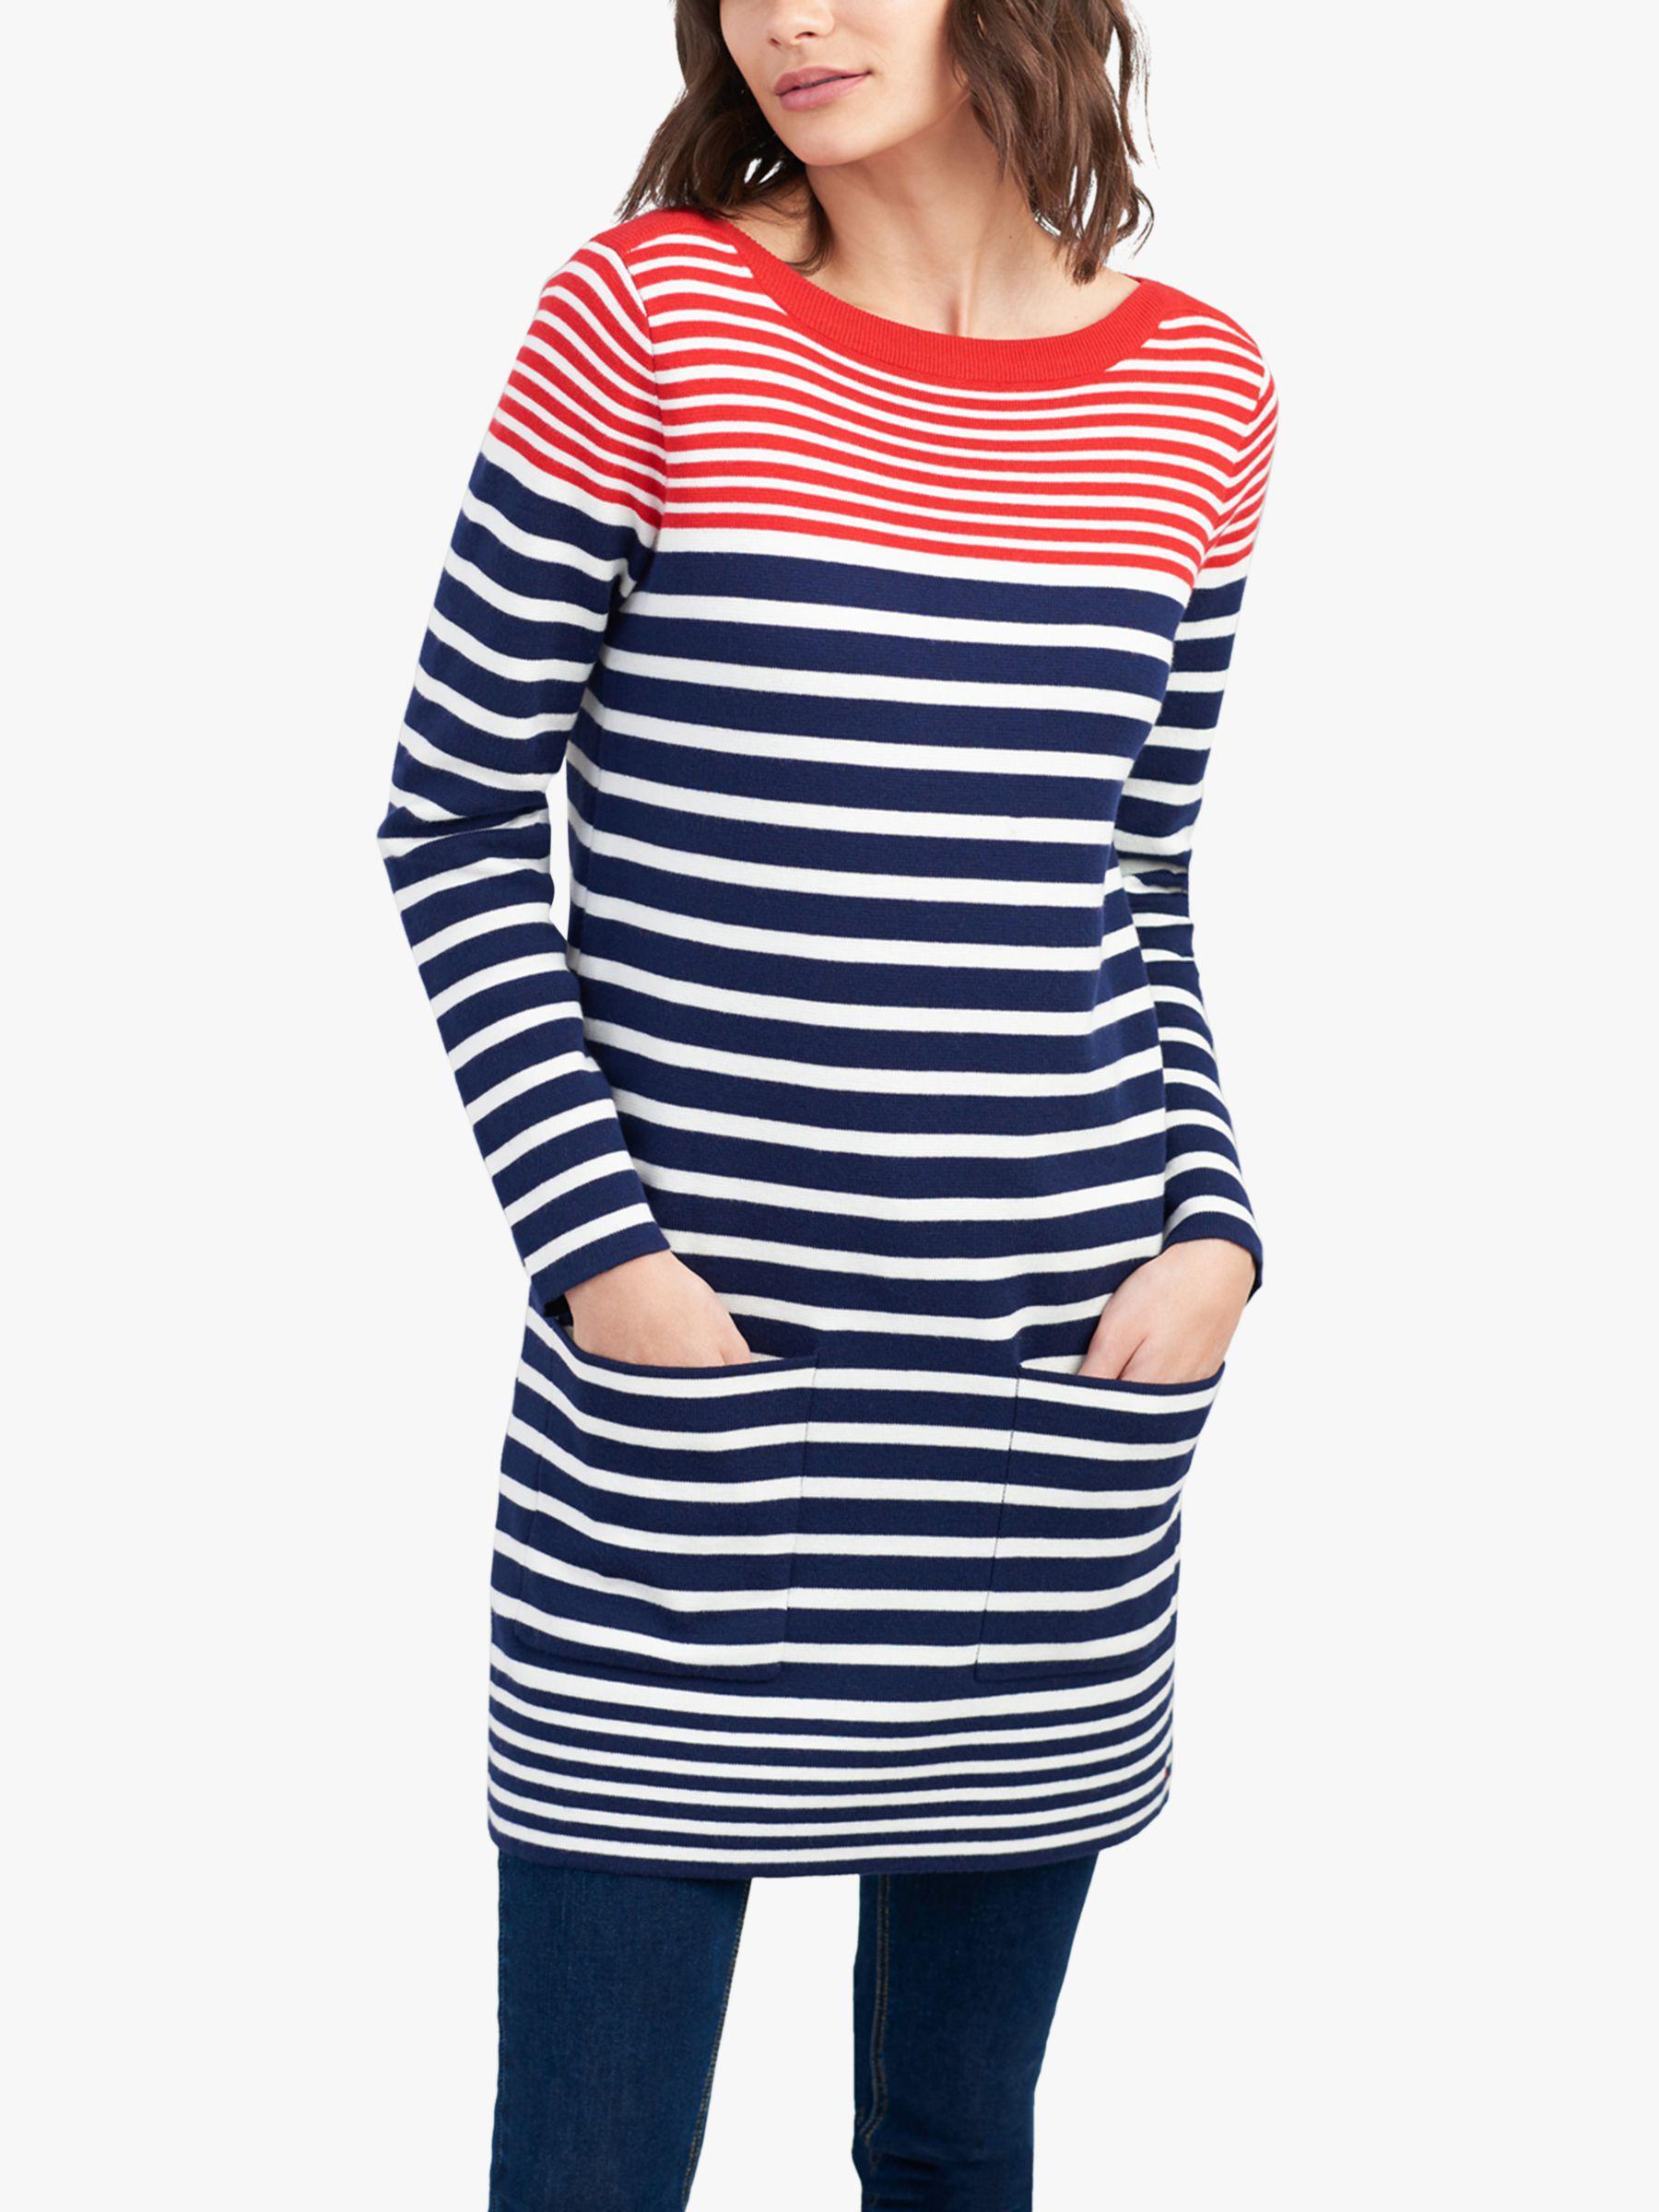 bc9d2960116cca Joules Freida Stripe Tunic in Blue - Lyst